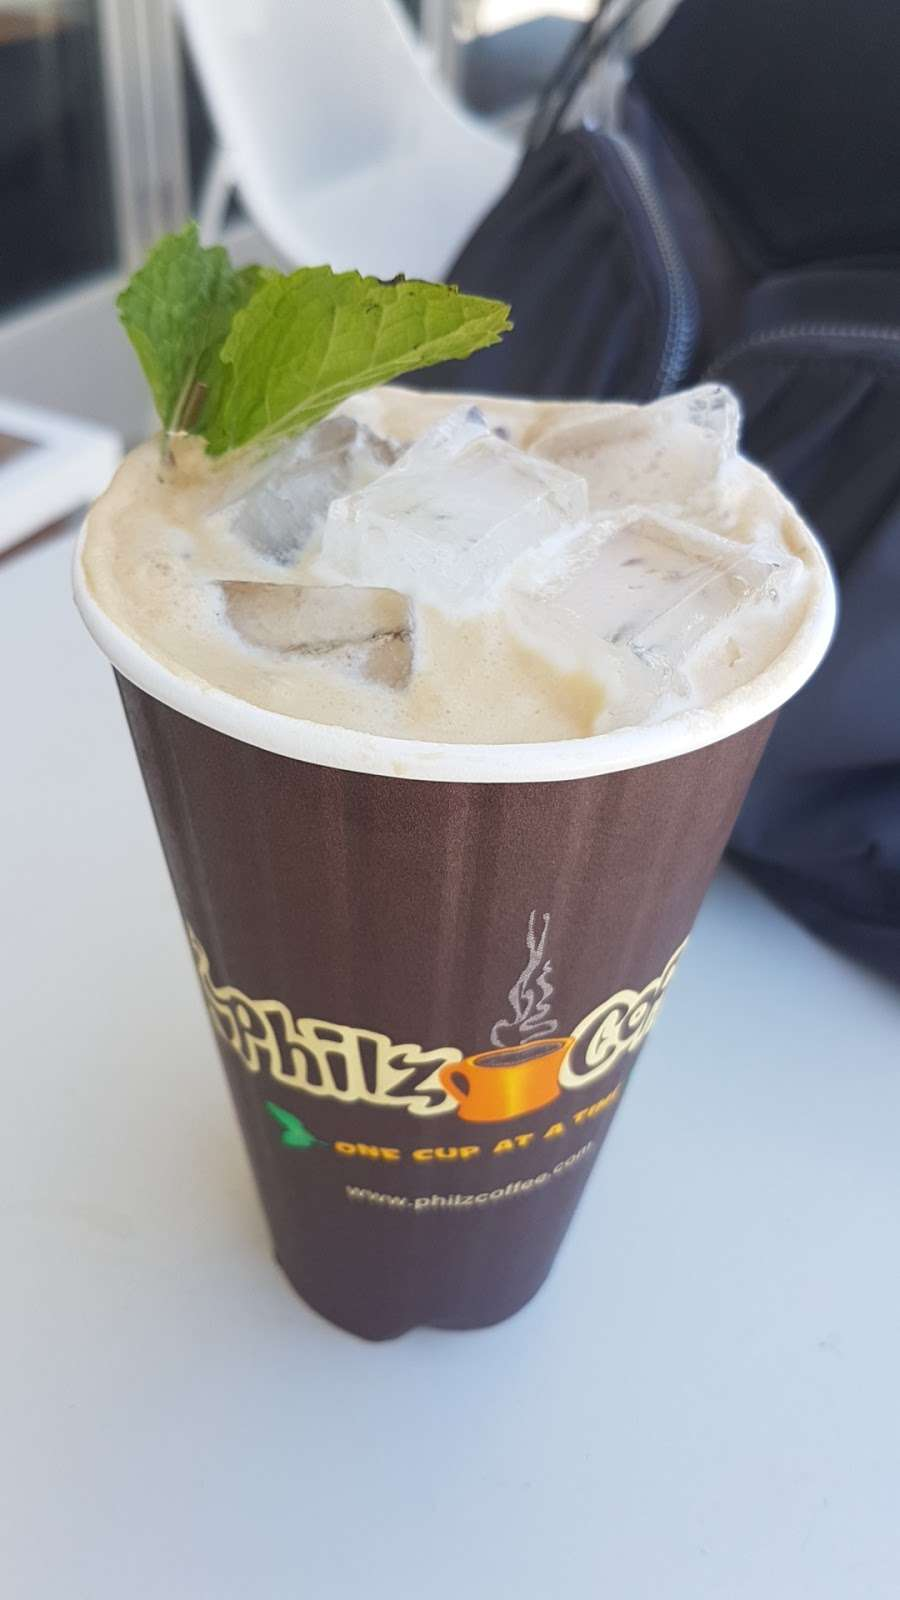 Philz Coffee - cafe    Photo 6 of 10   Address: 19439 Stevens Creek Blvd, Cupertino, CA 95014, USA   Phone: (408) 200-4856